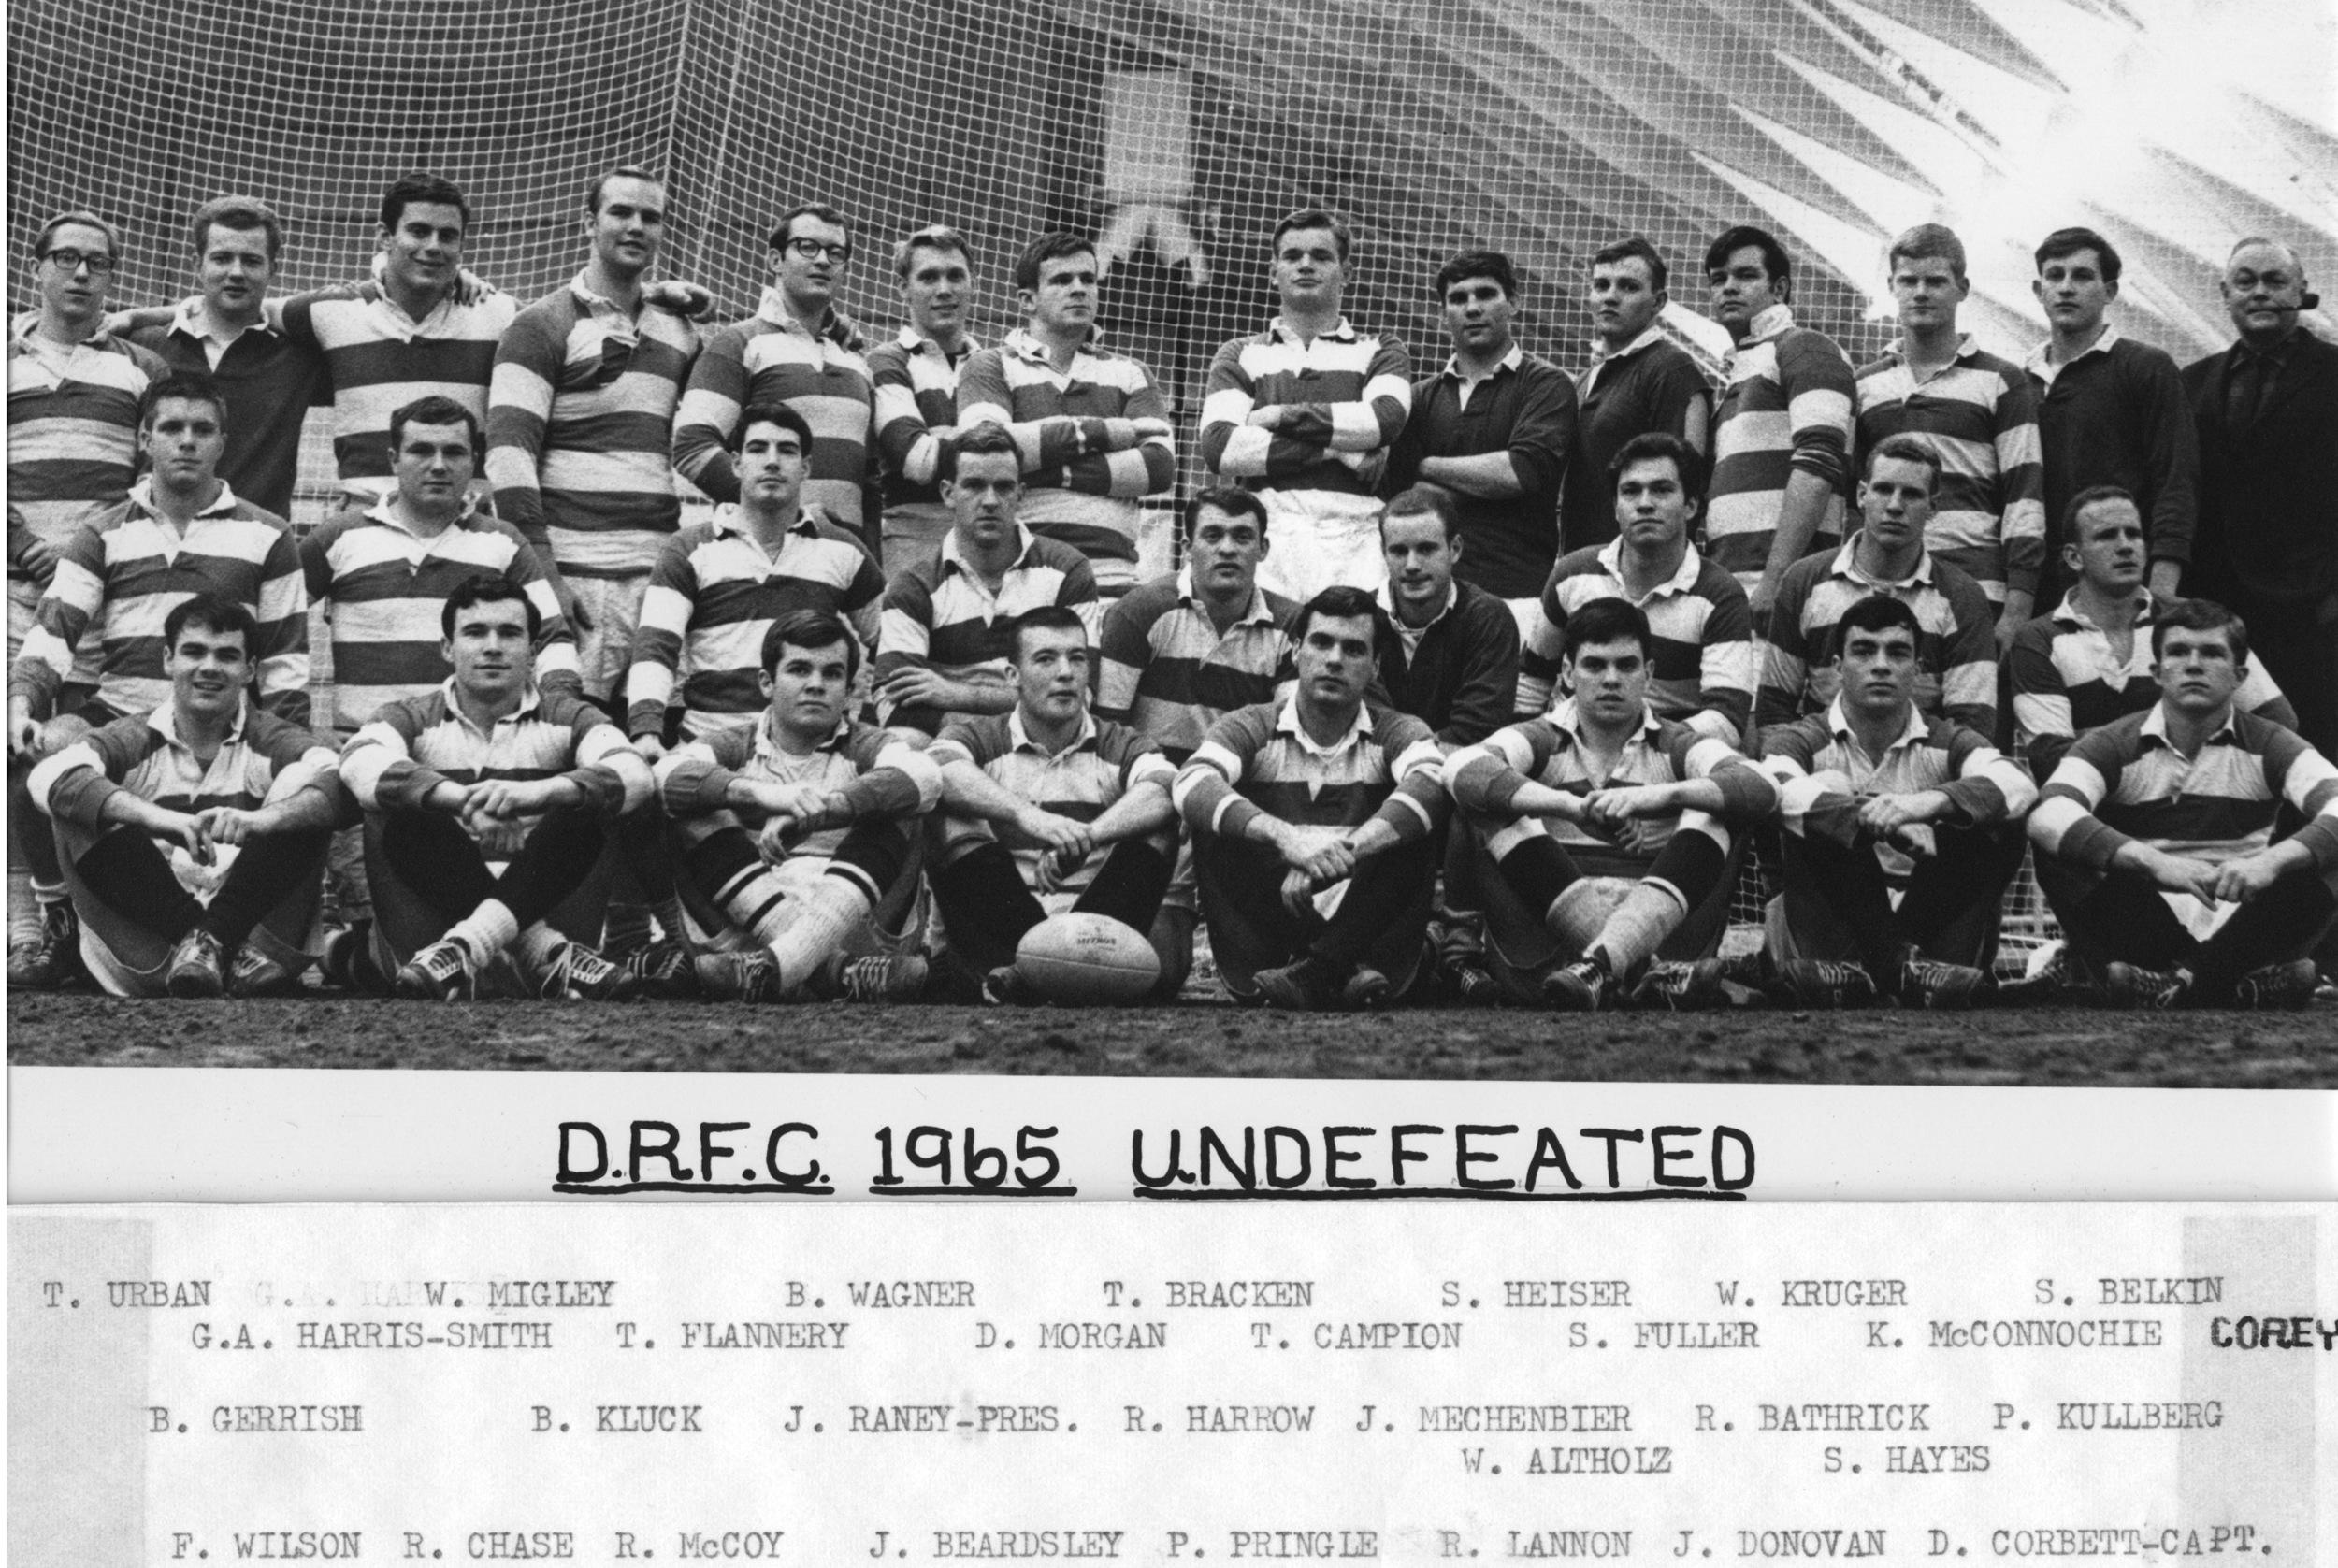 1965 Unfefeated DRFC Team_DO21_2a.jpg